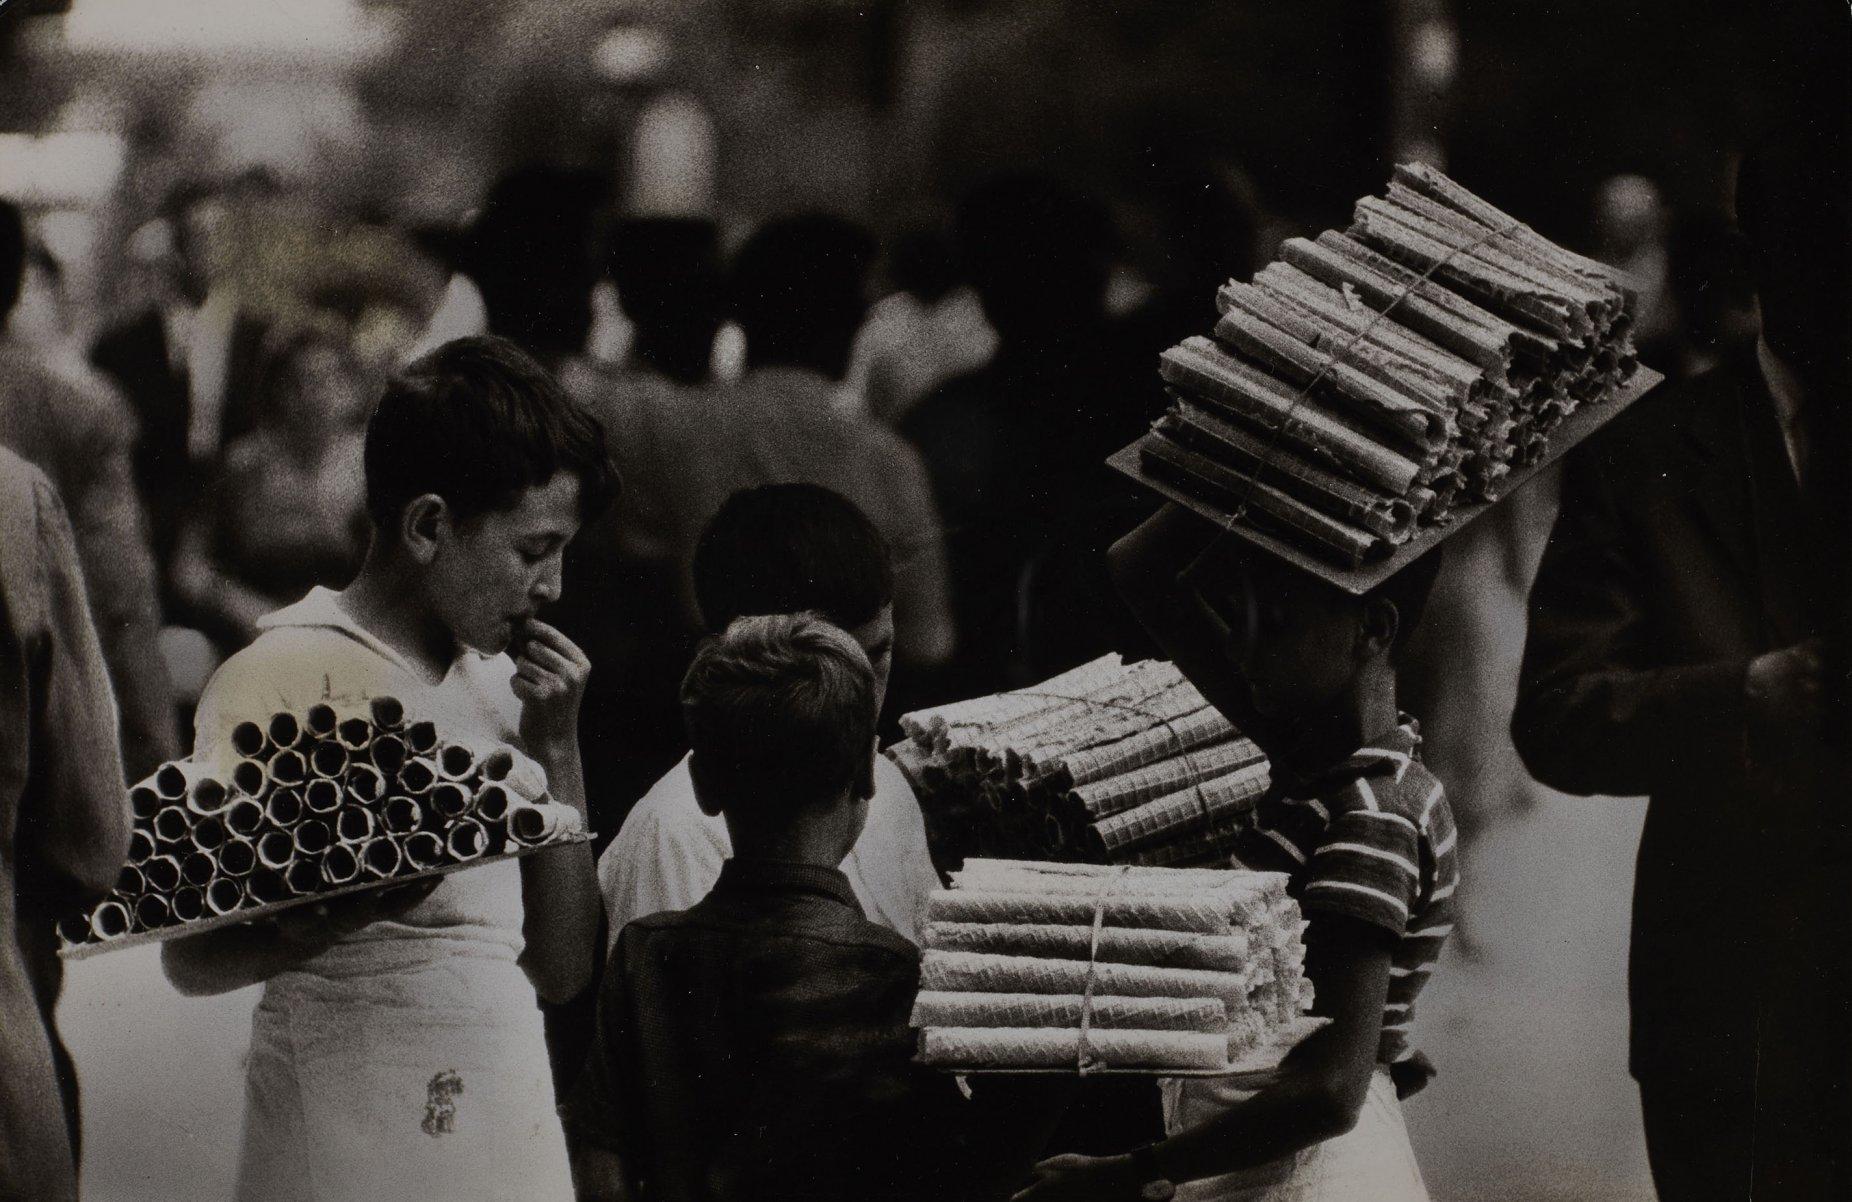 Vivir en Madrid (1967) - Francisco Ontañón